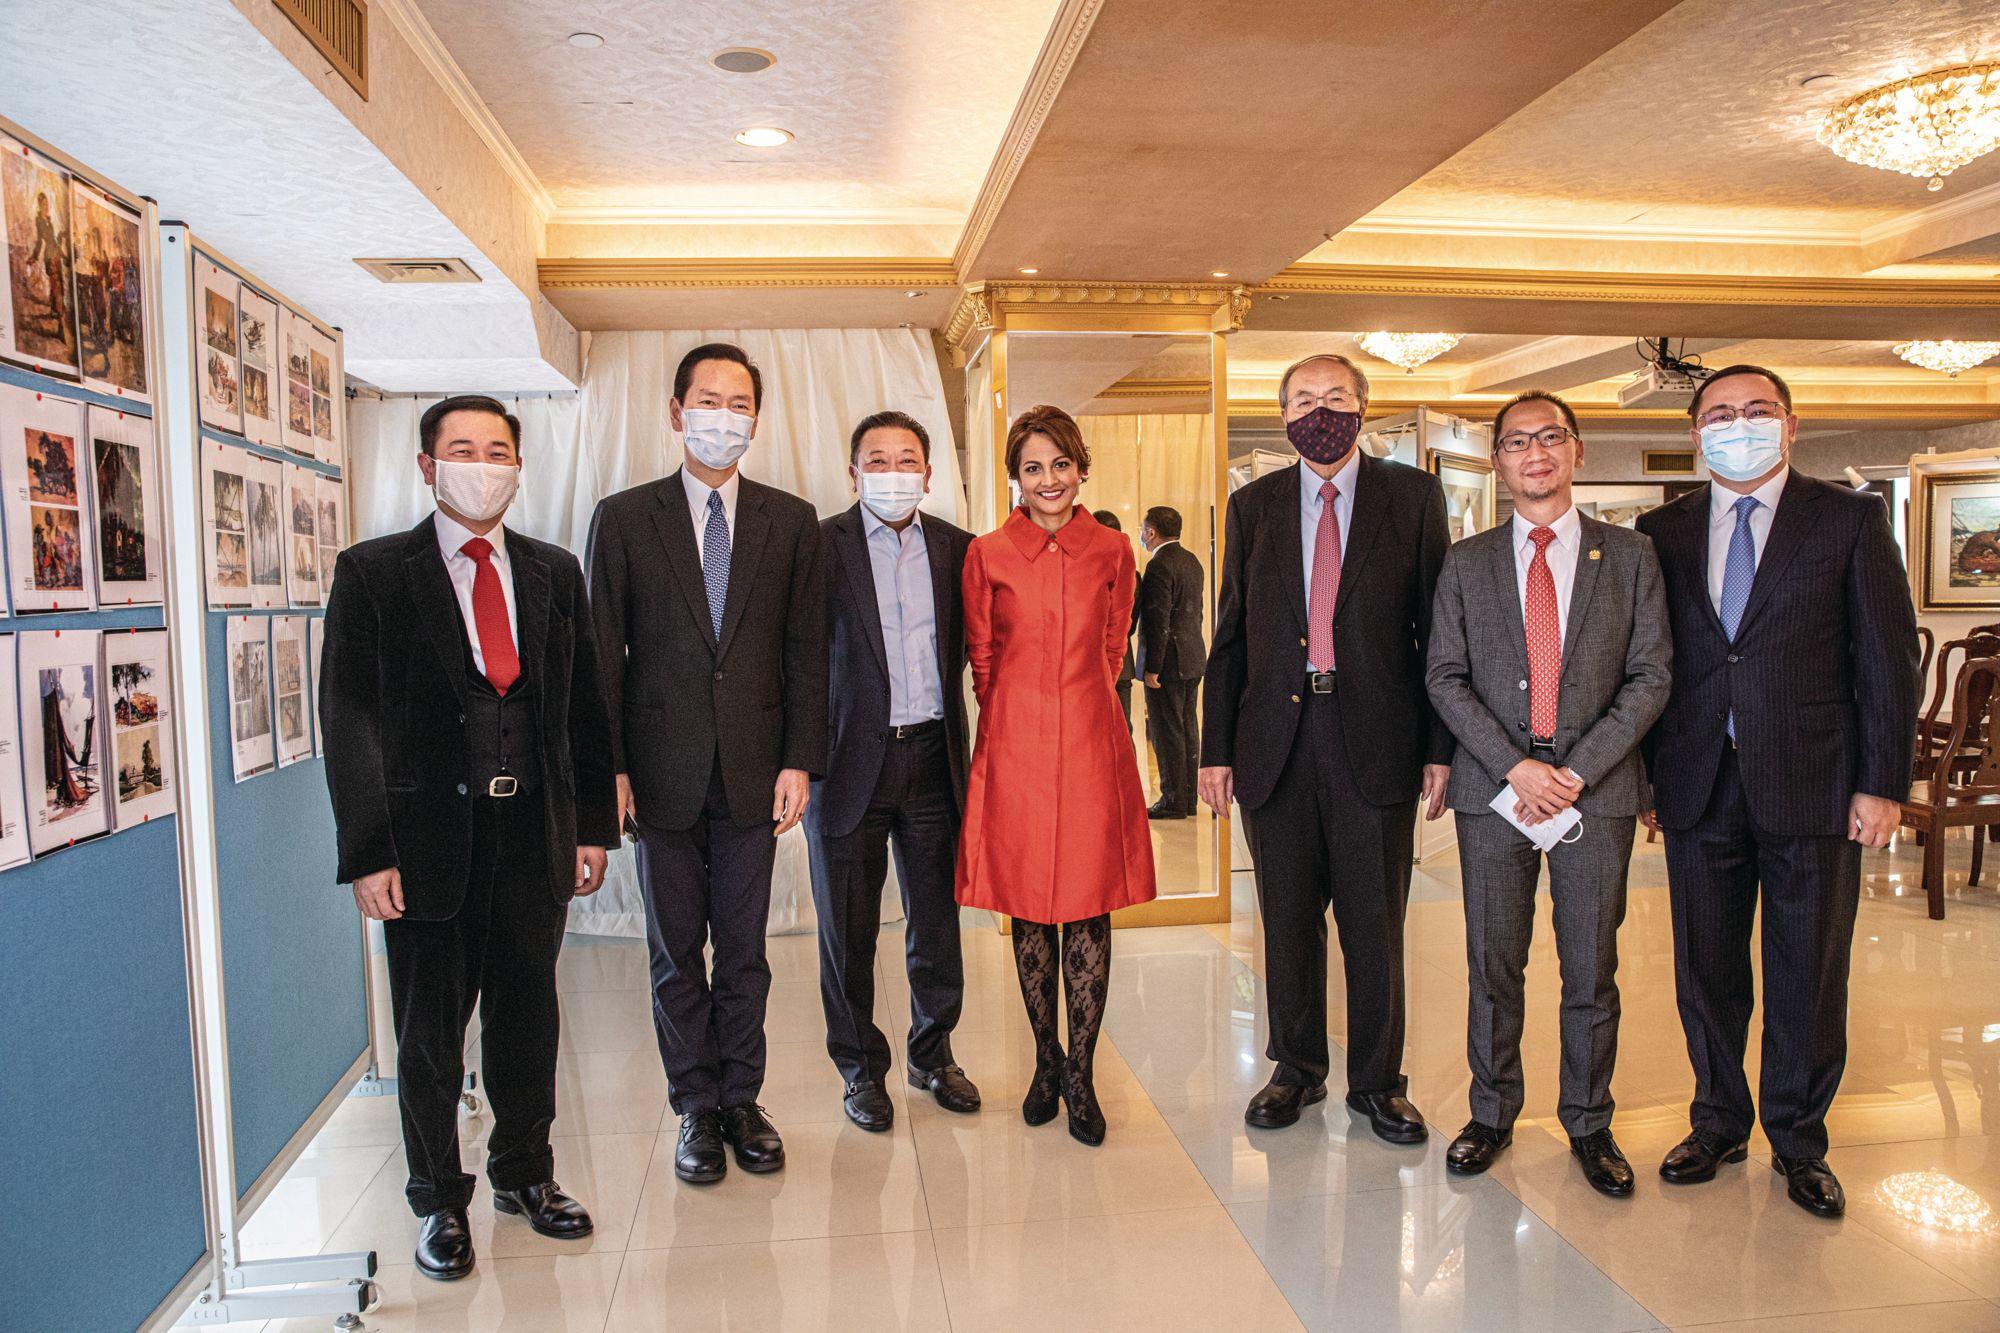 Saniza Othman And Michael Yong-Haron Open A Yong Mun Sen Exhibition